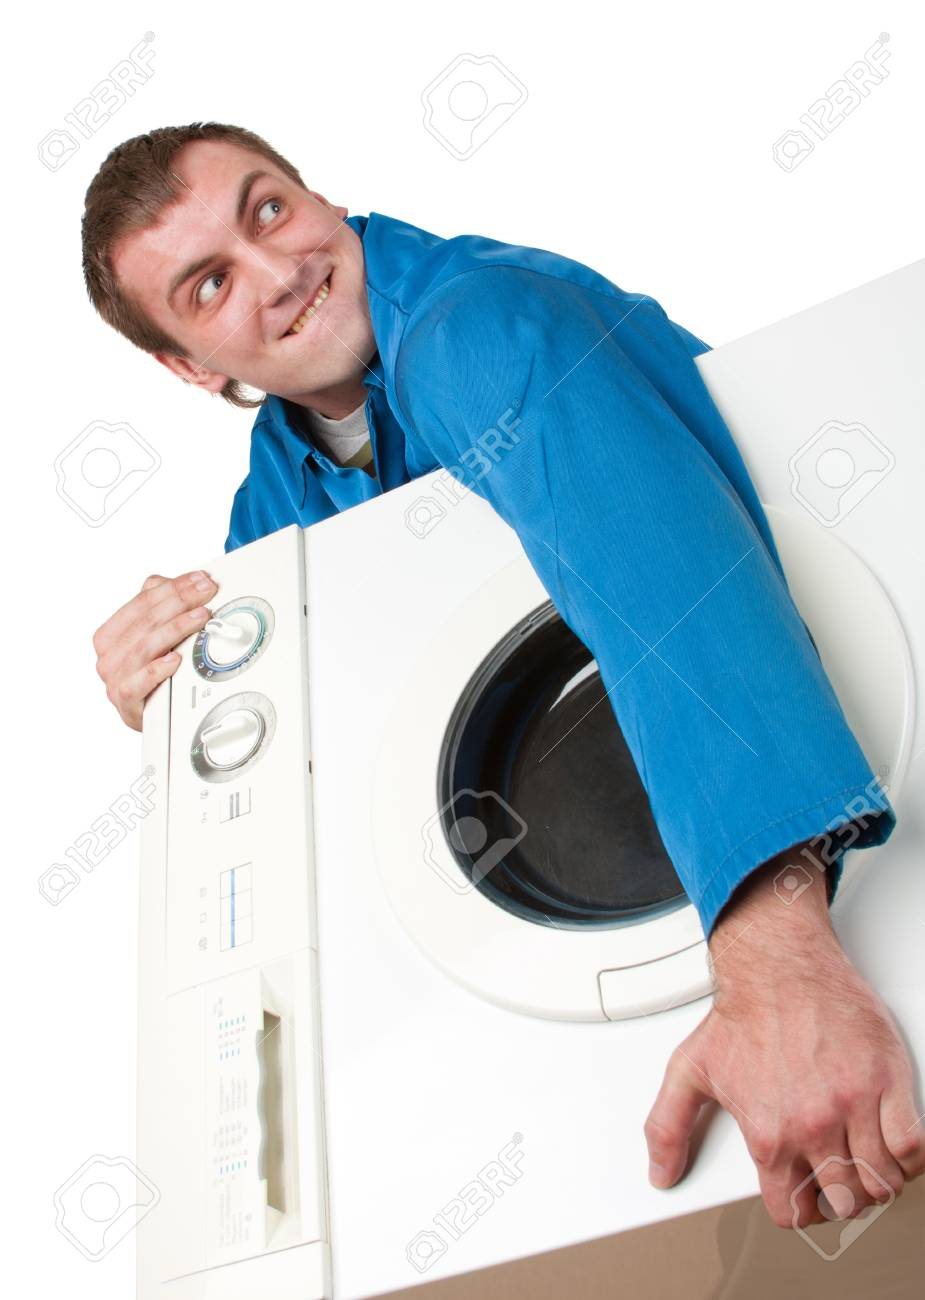 Ominous thief holding stolen washing machine. Isolated on white Stock Photo - 18426940